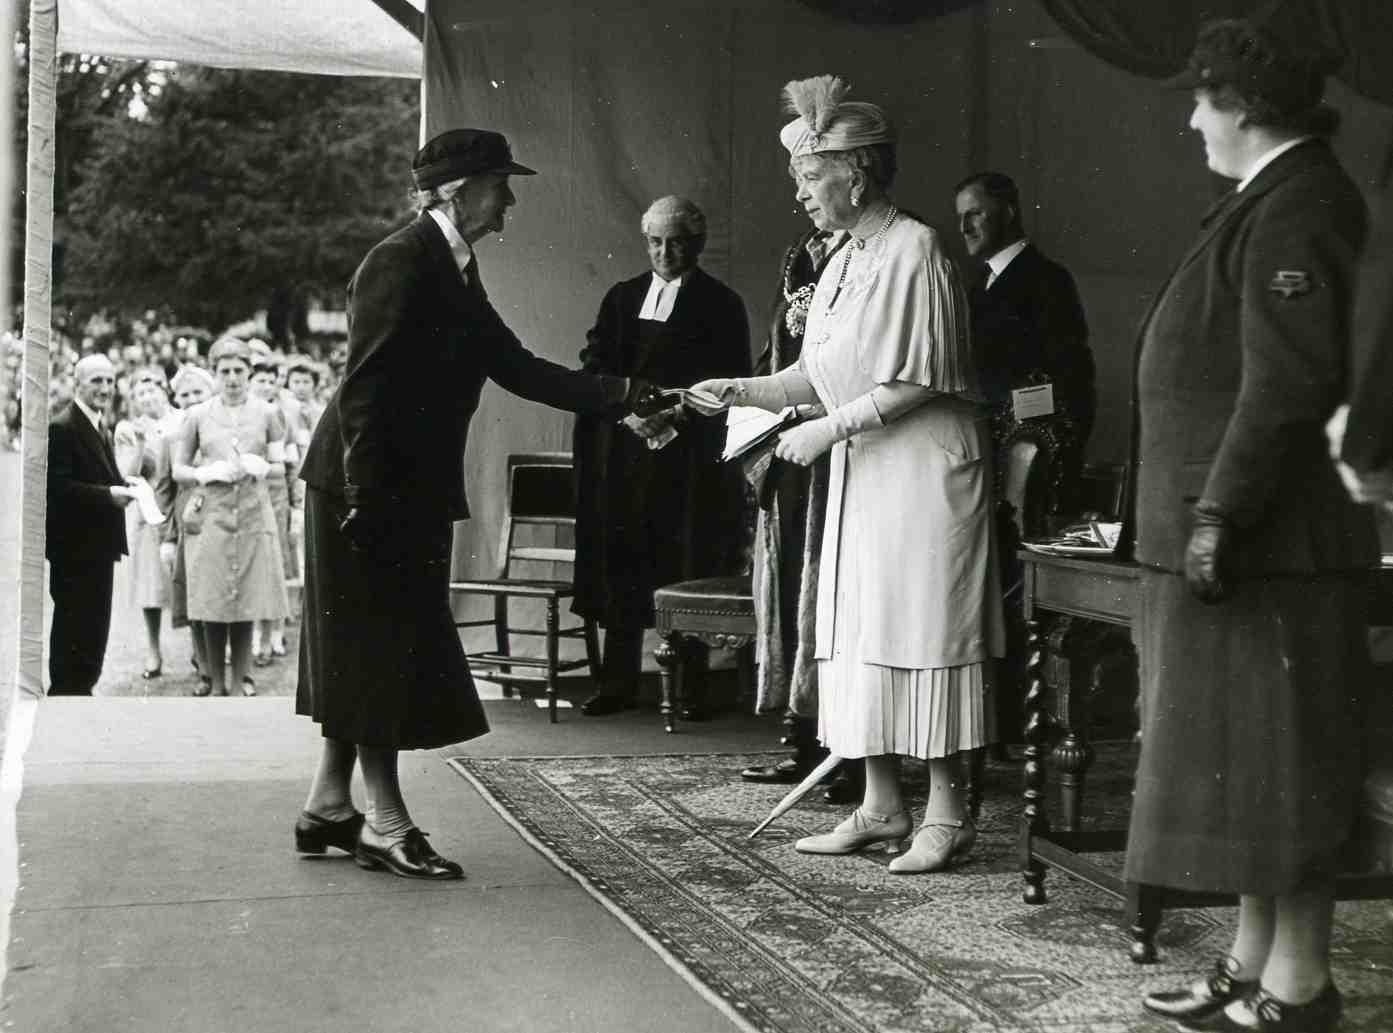 Queen Mary awarding WA staff